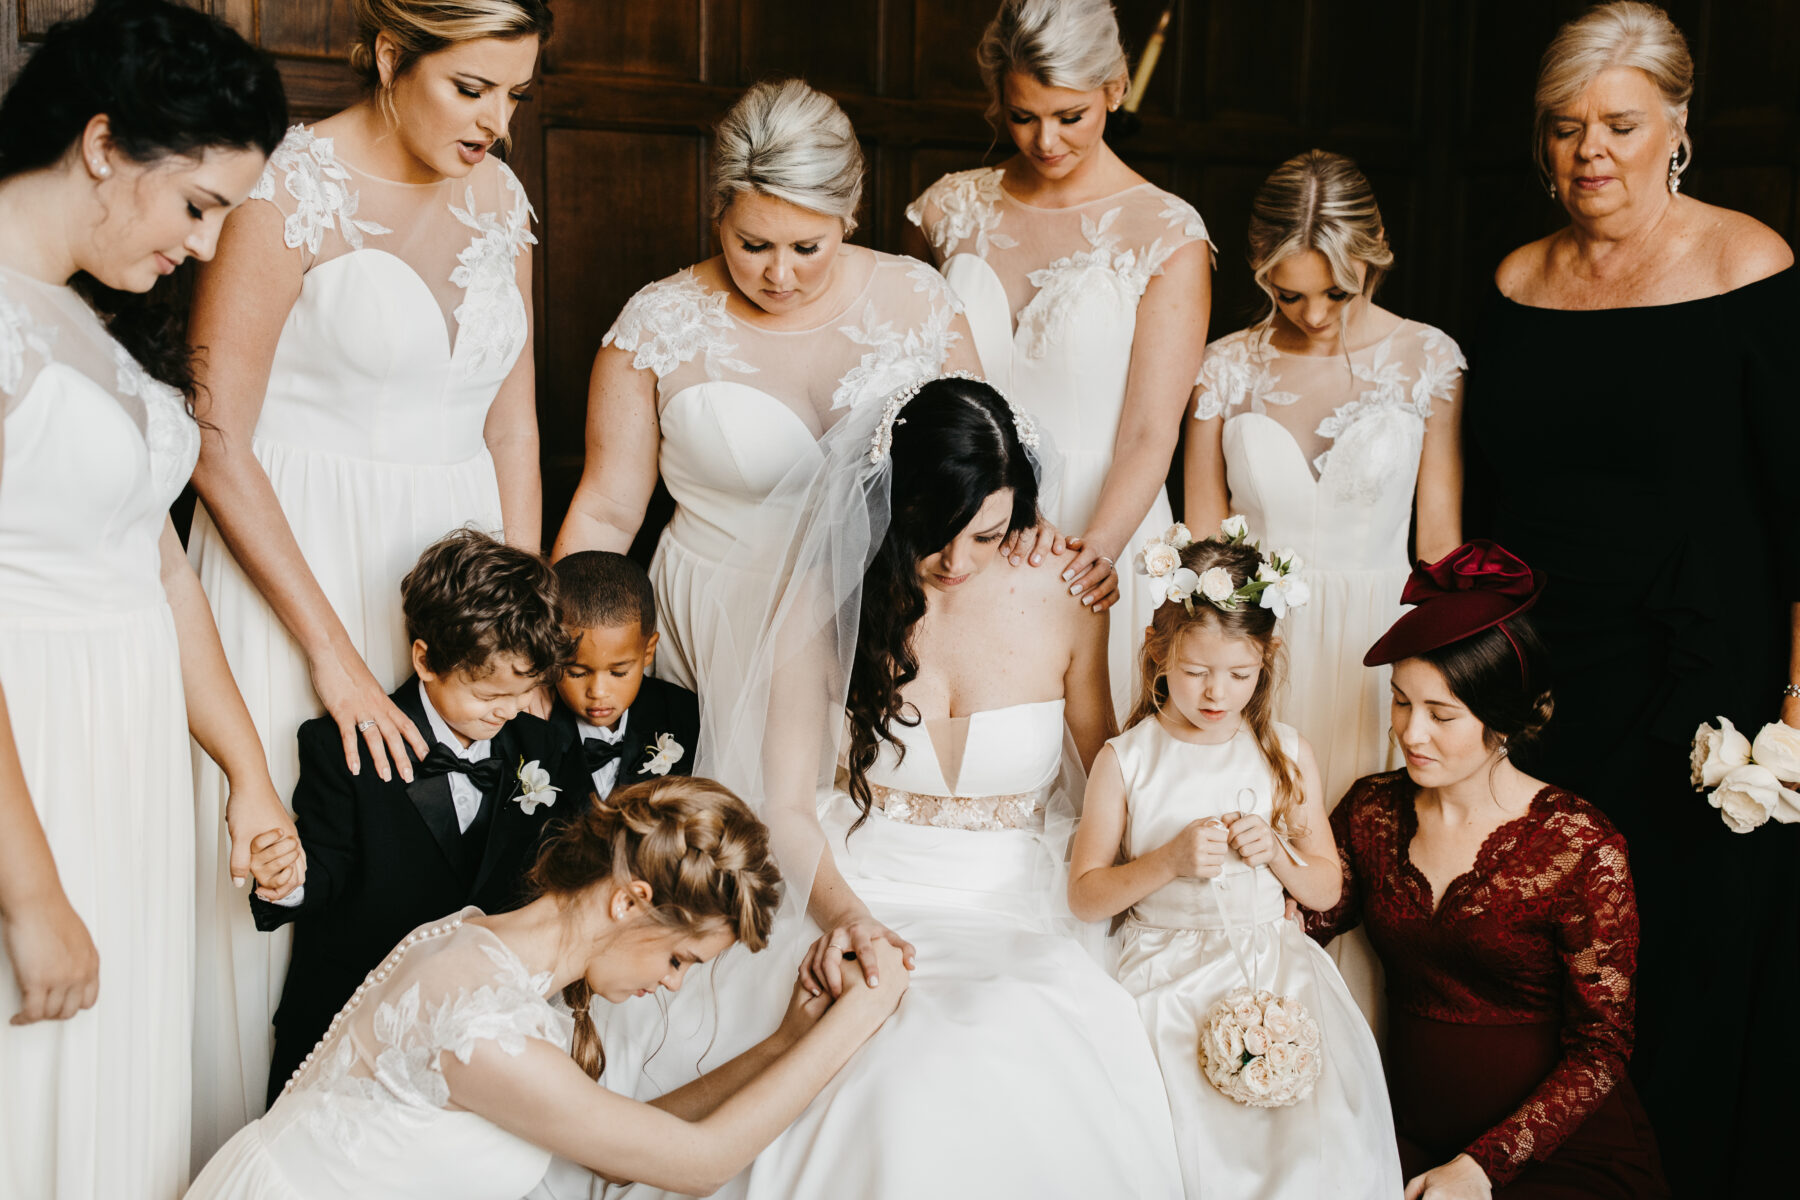 Bridal party wedding prayer | Nashville Bride Guide